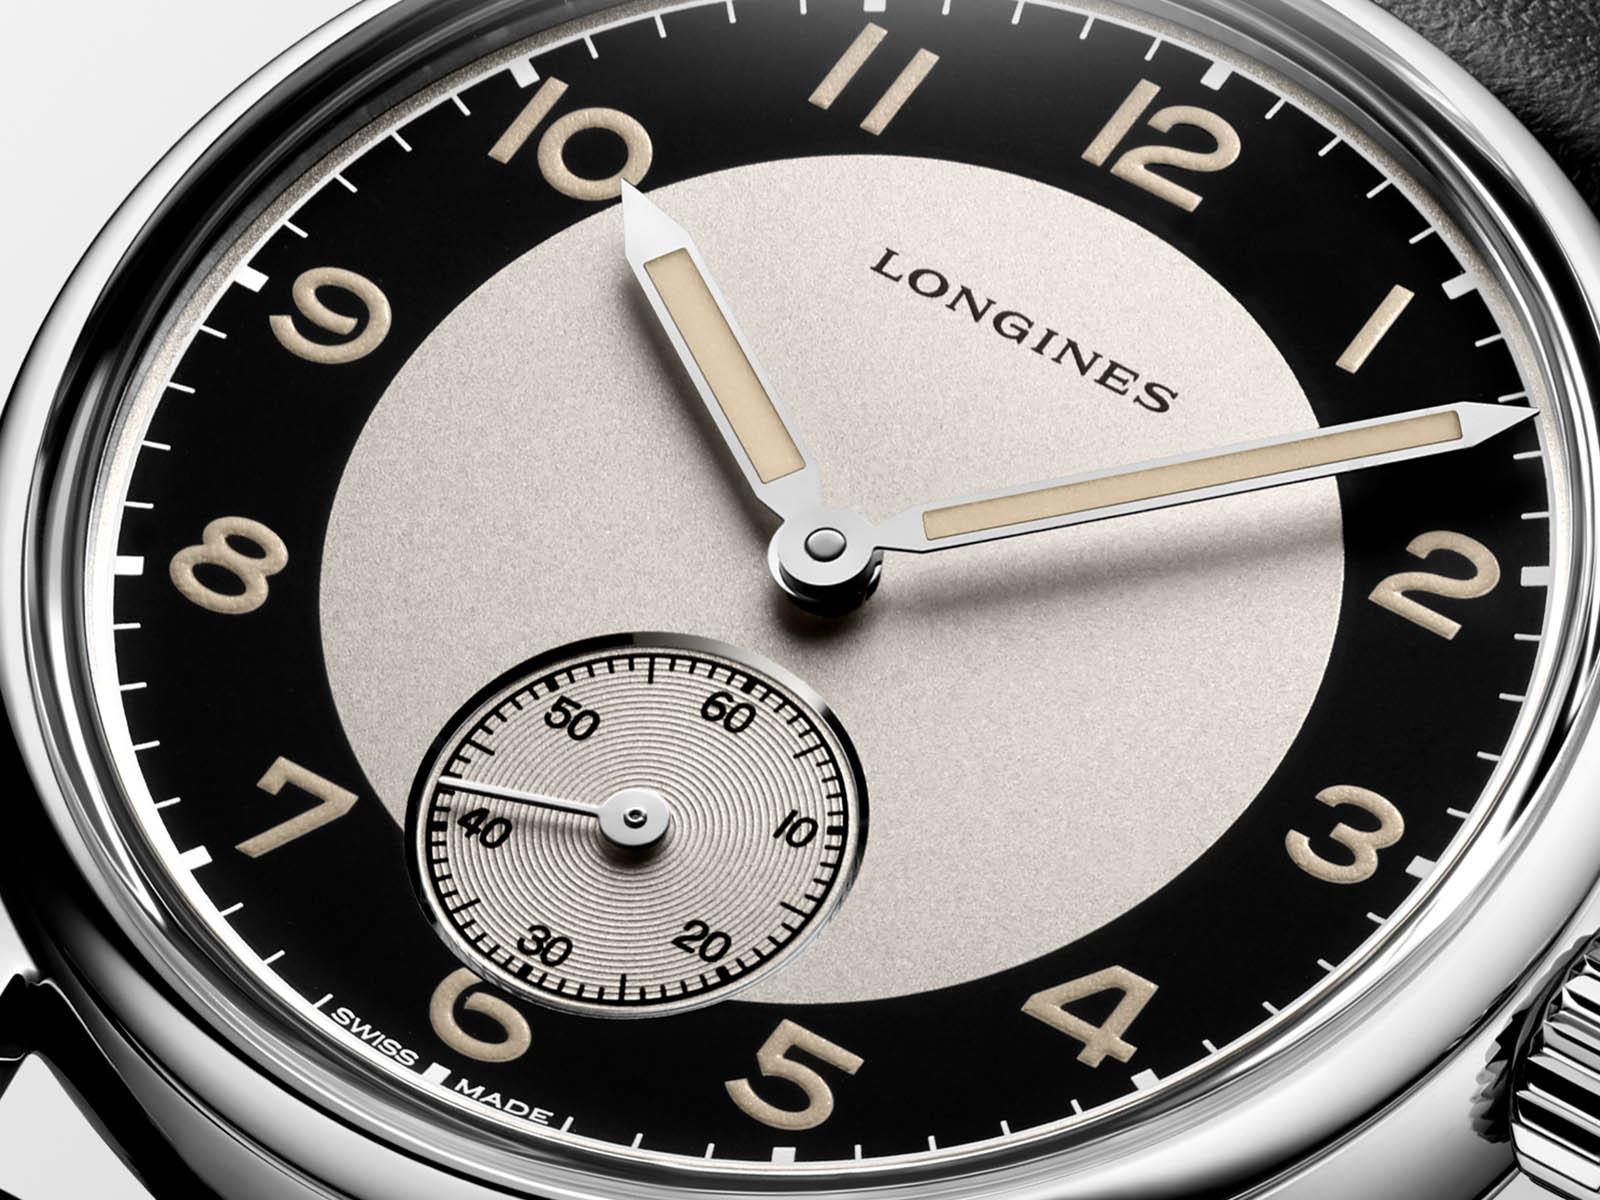 l2-330-4-93-0-longines-heritage-classic-tuxedo-5.jpg